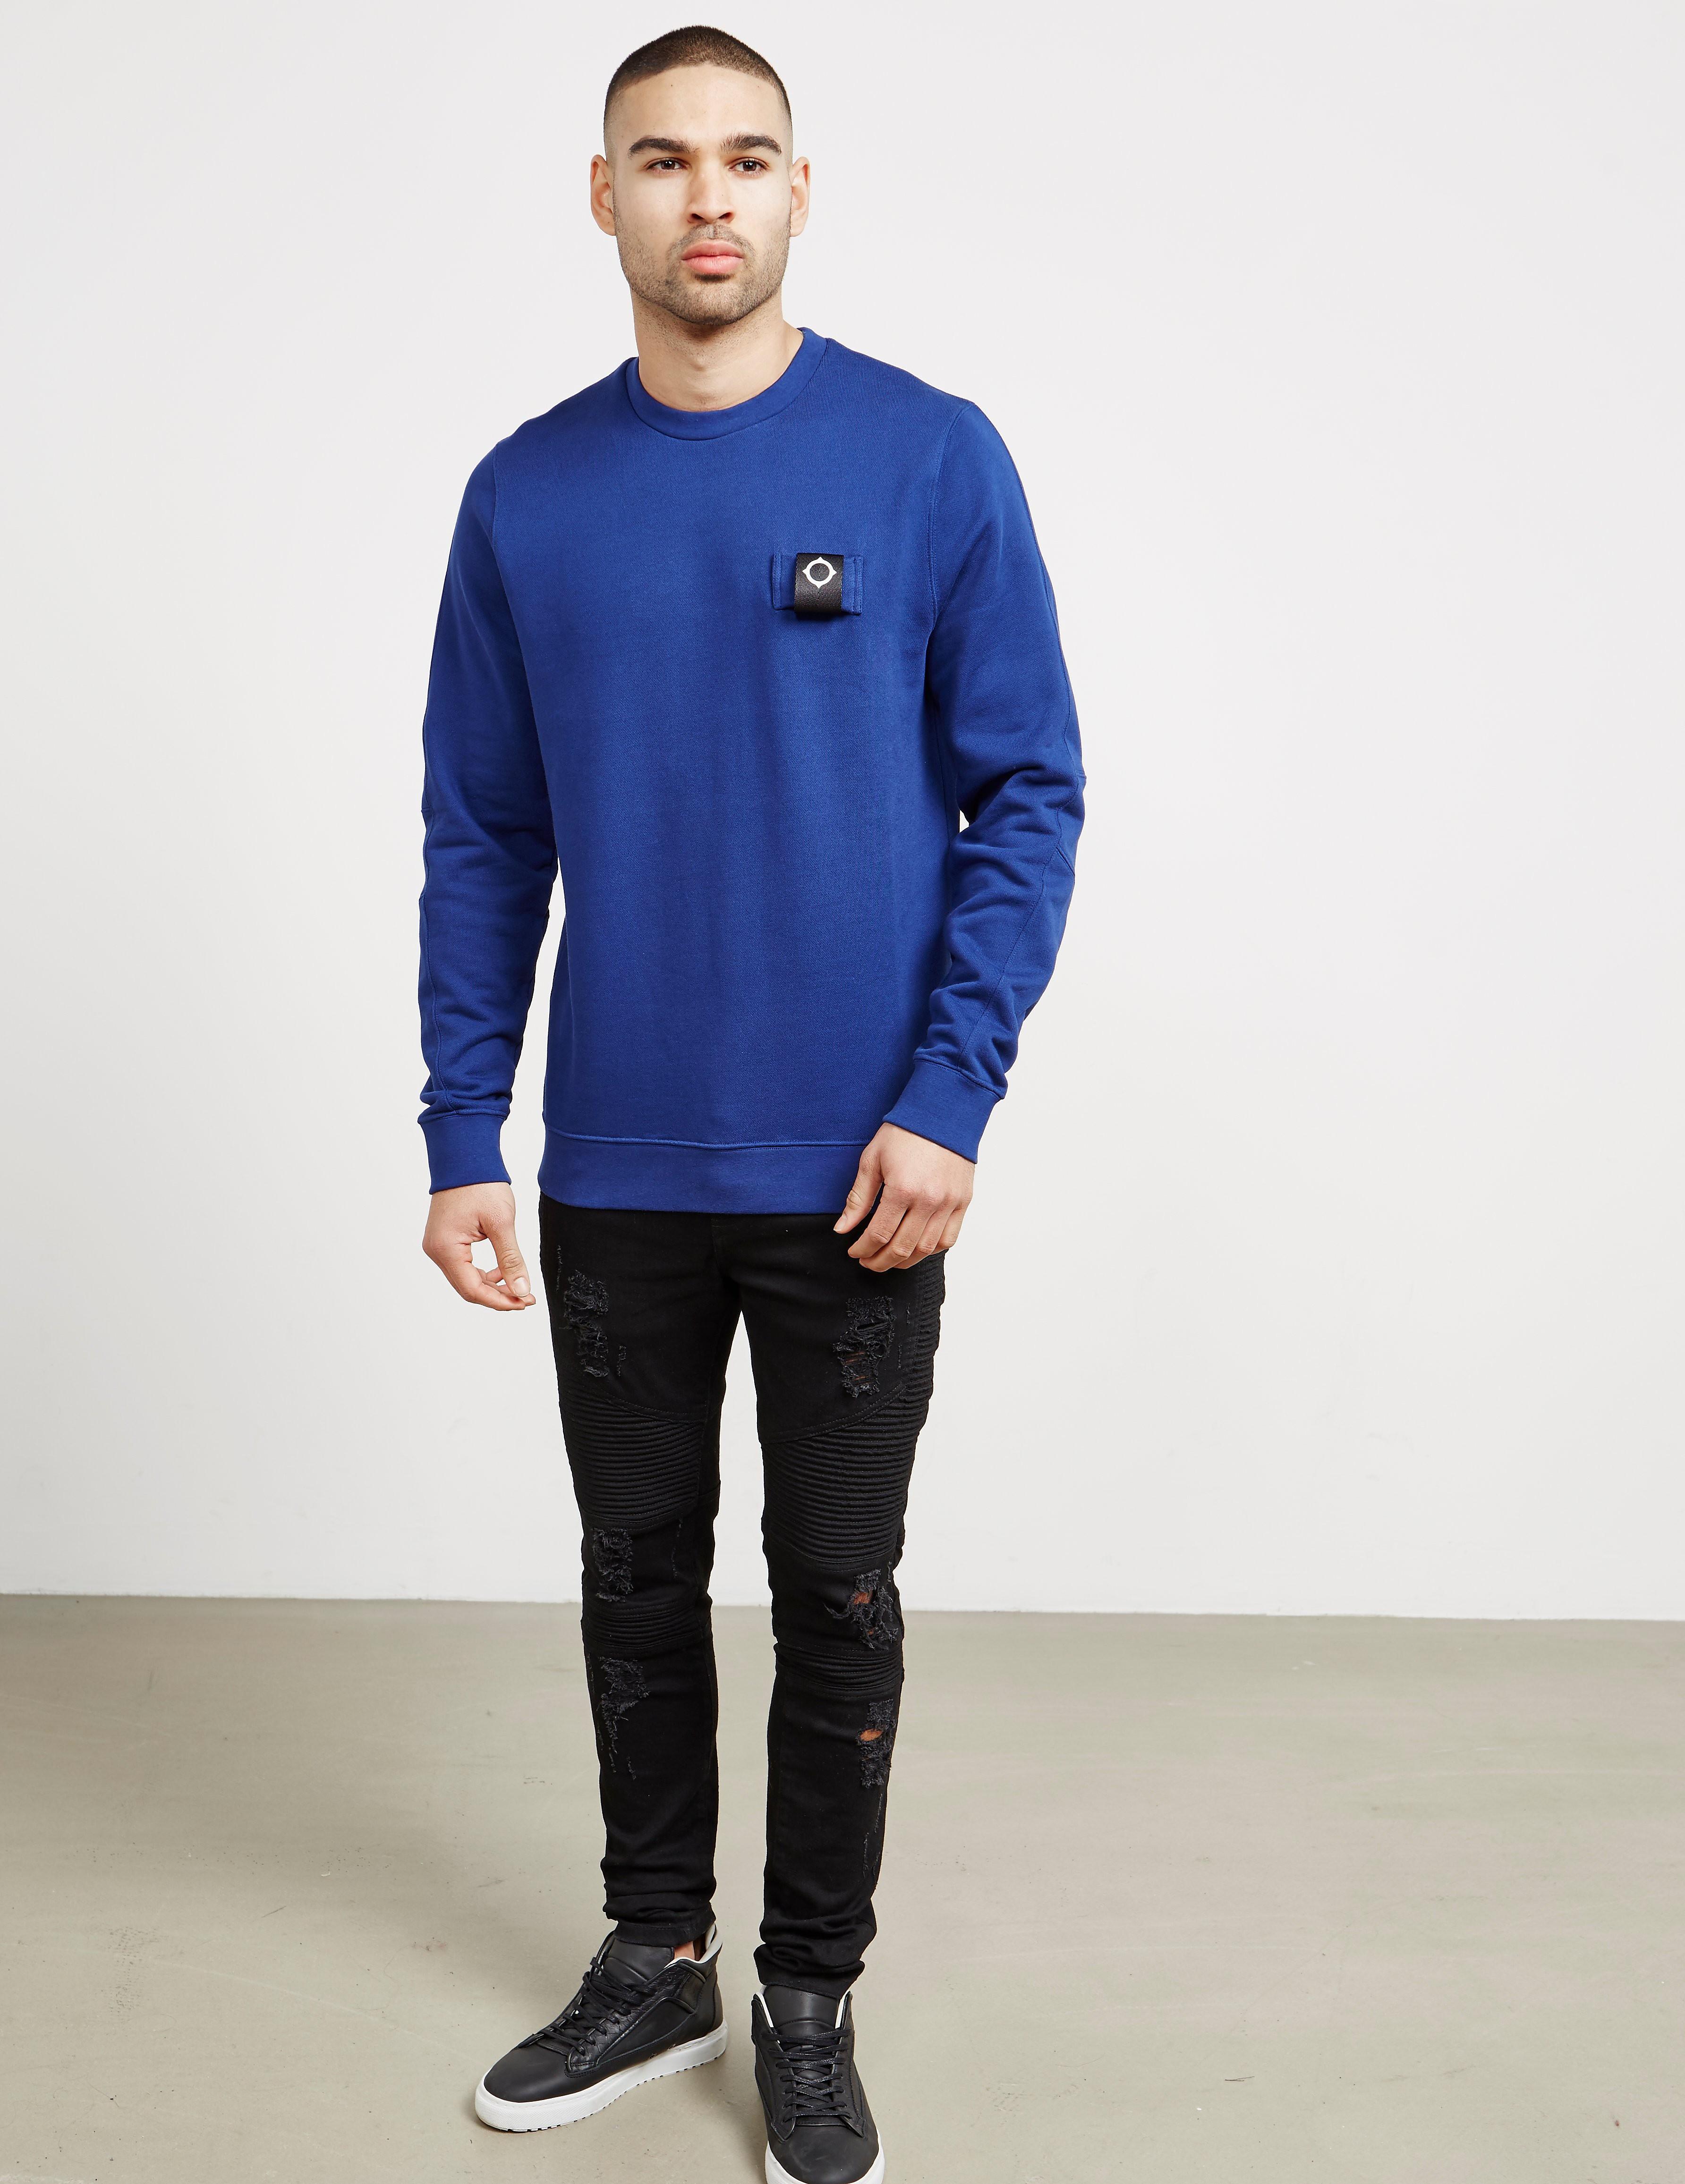 MA STRUM Training Crew Sweatshirt